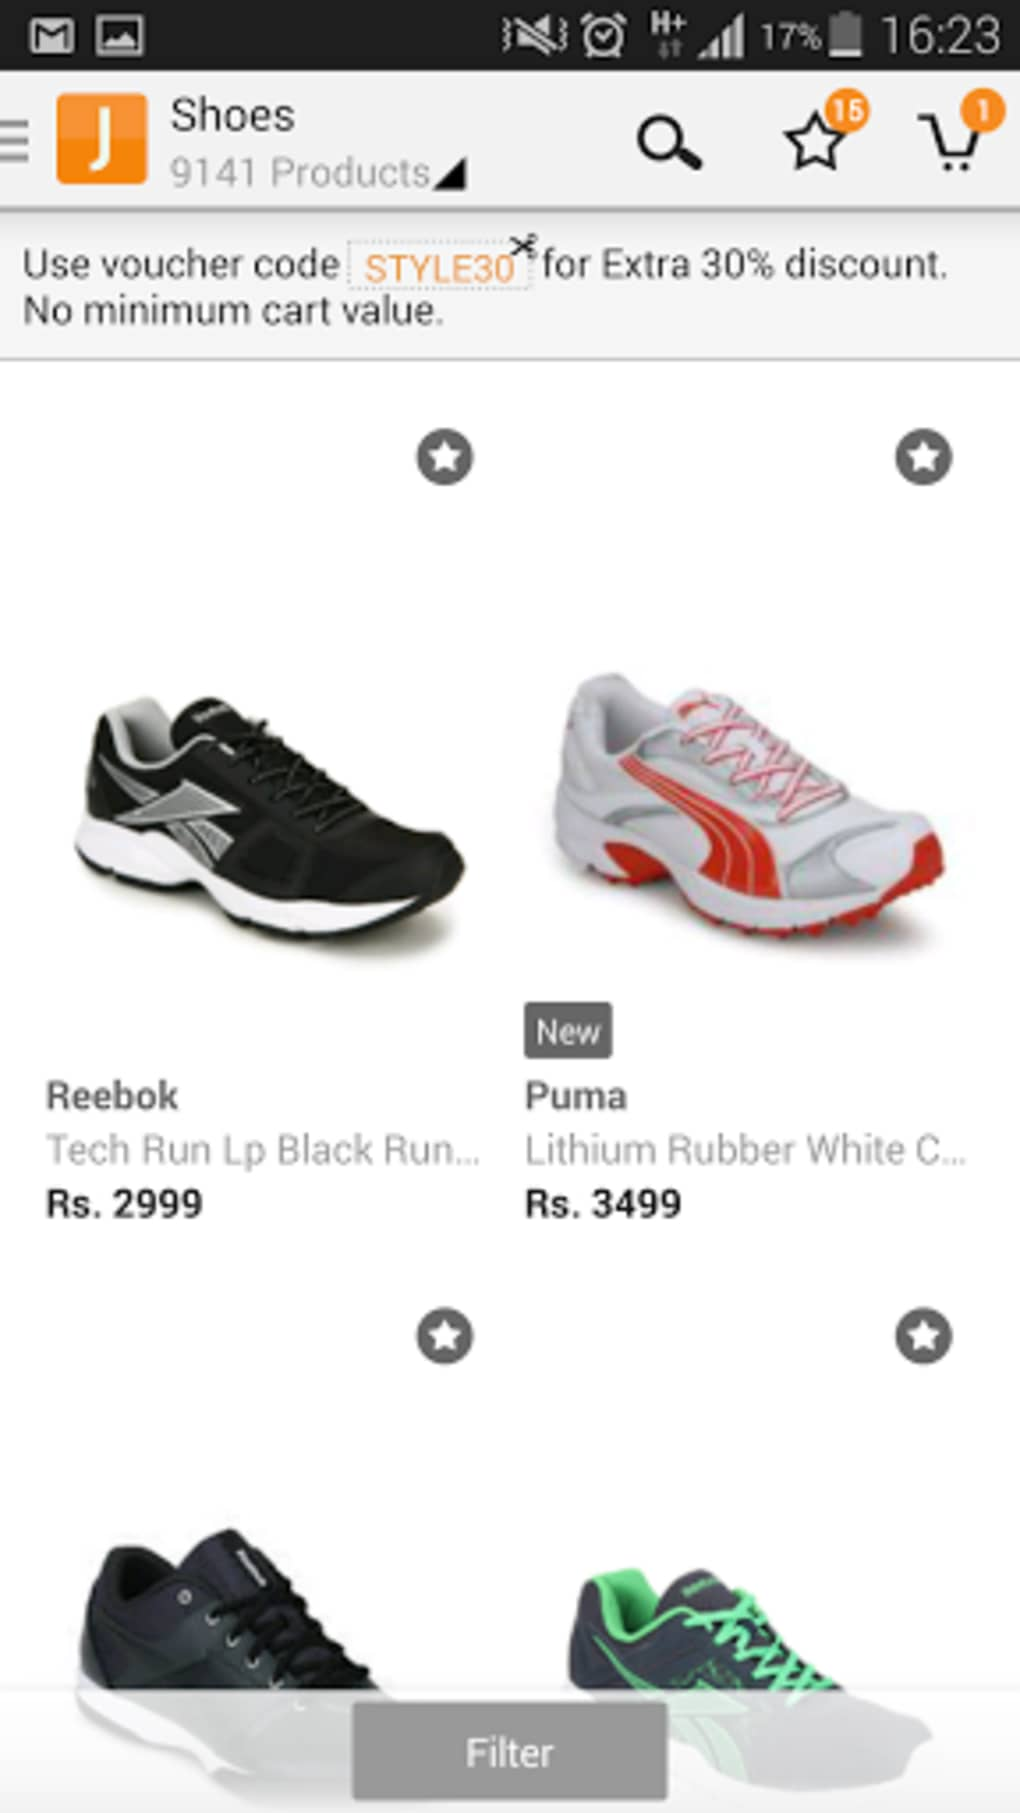 c3acc5b3205d98 Jabong Com Adidas Tennis Shoes - Style Guru  Fashion